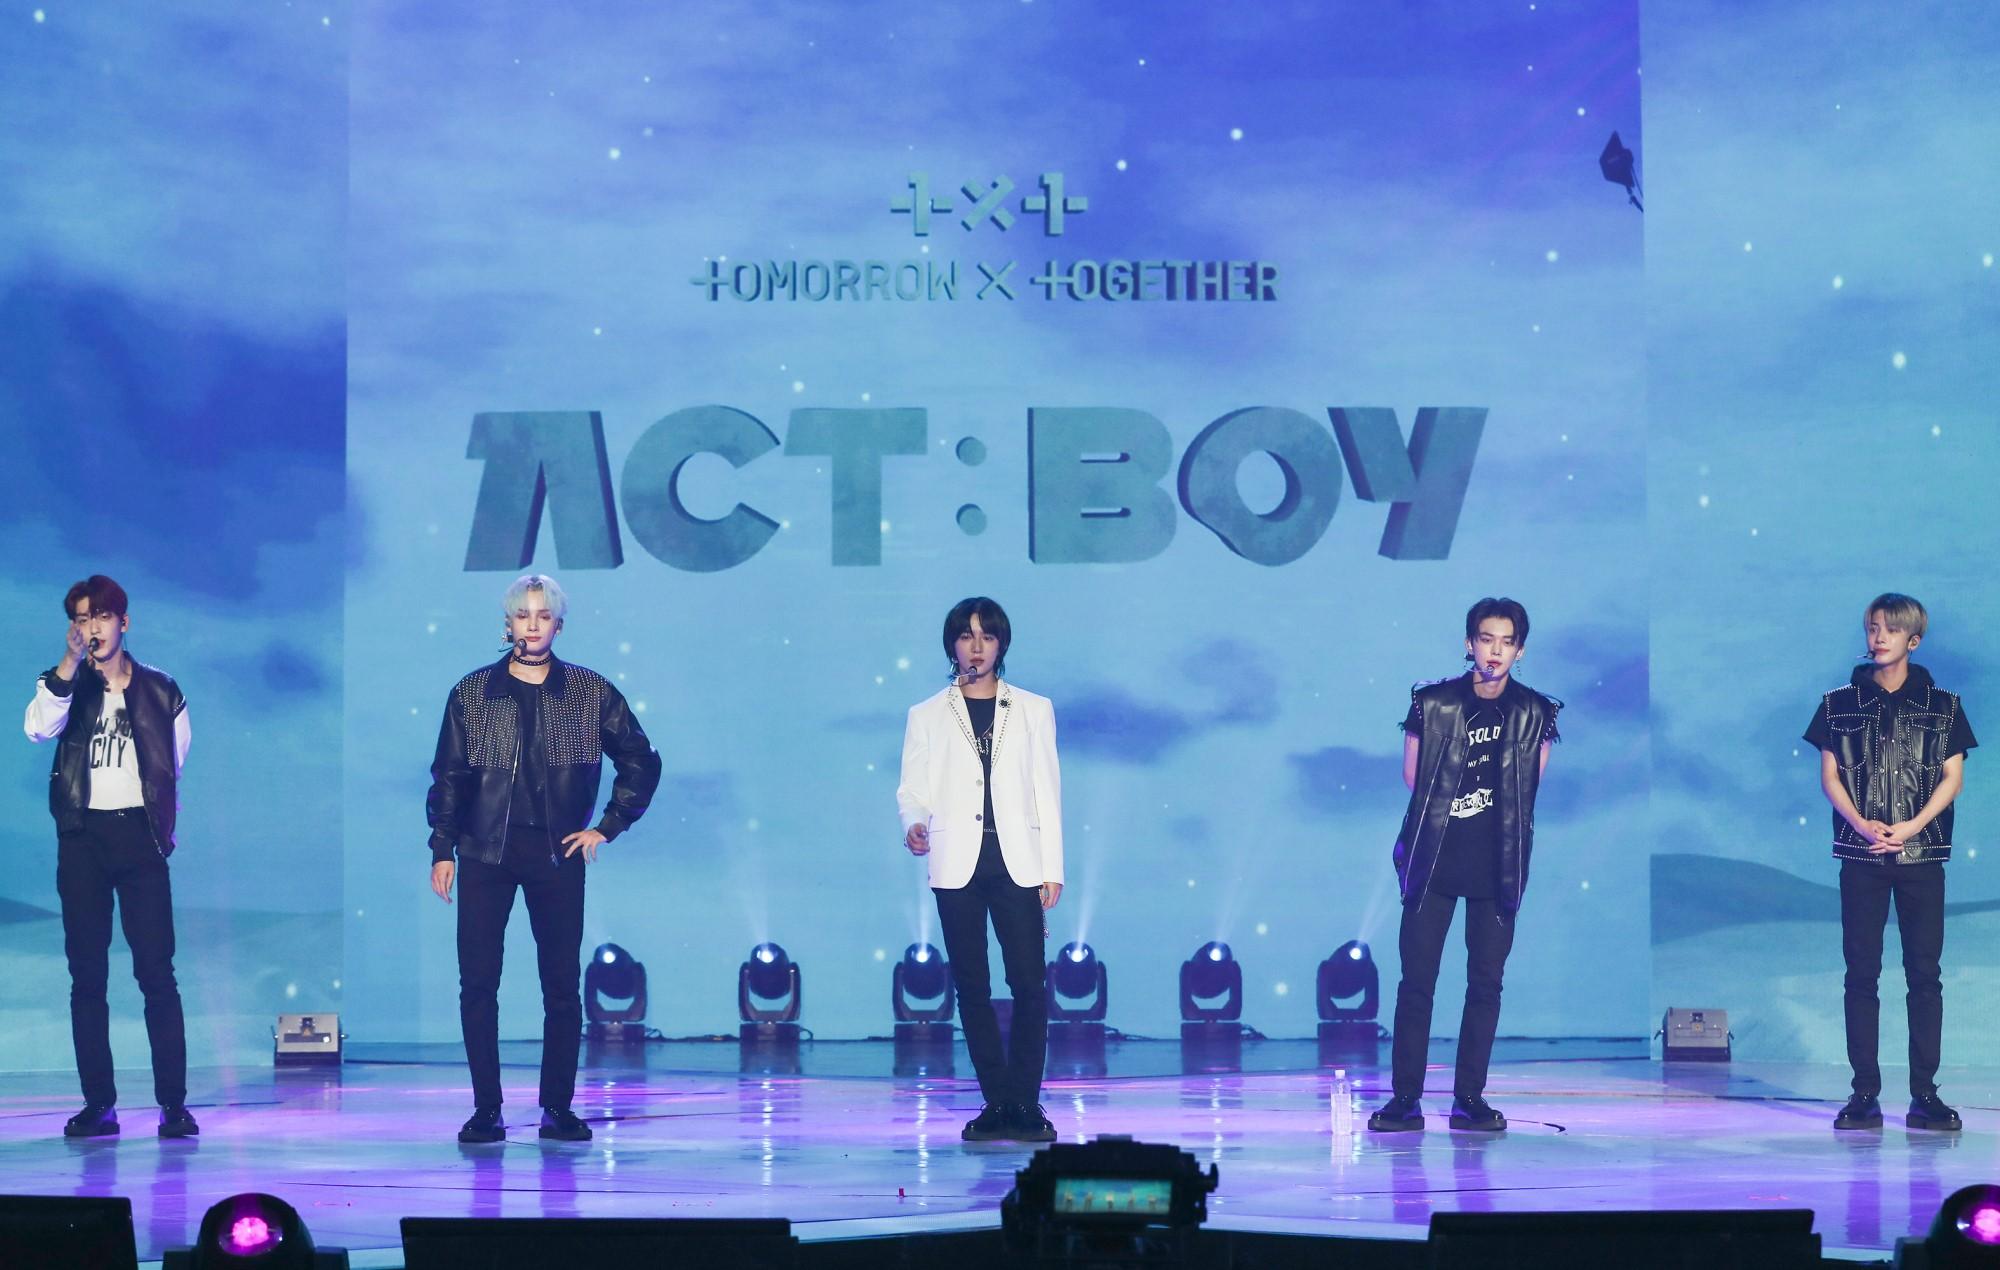 txt tomorrow together act boy concert live review online recap setlist